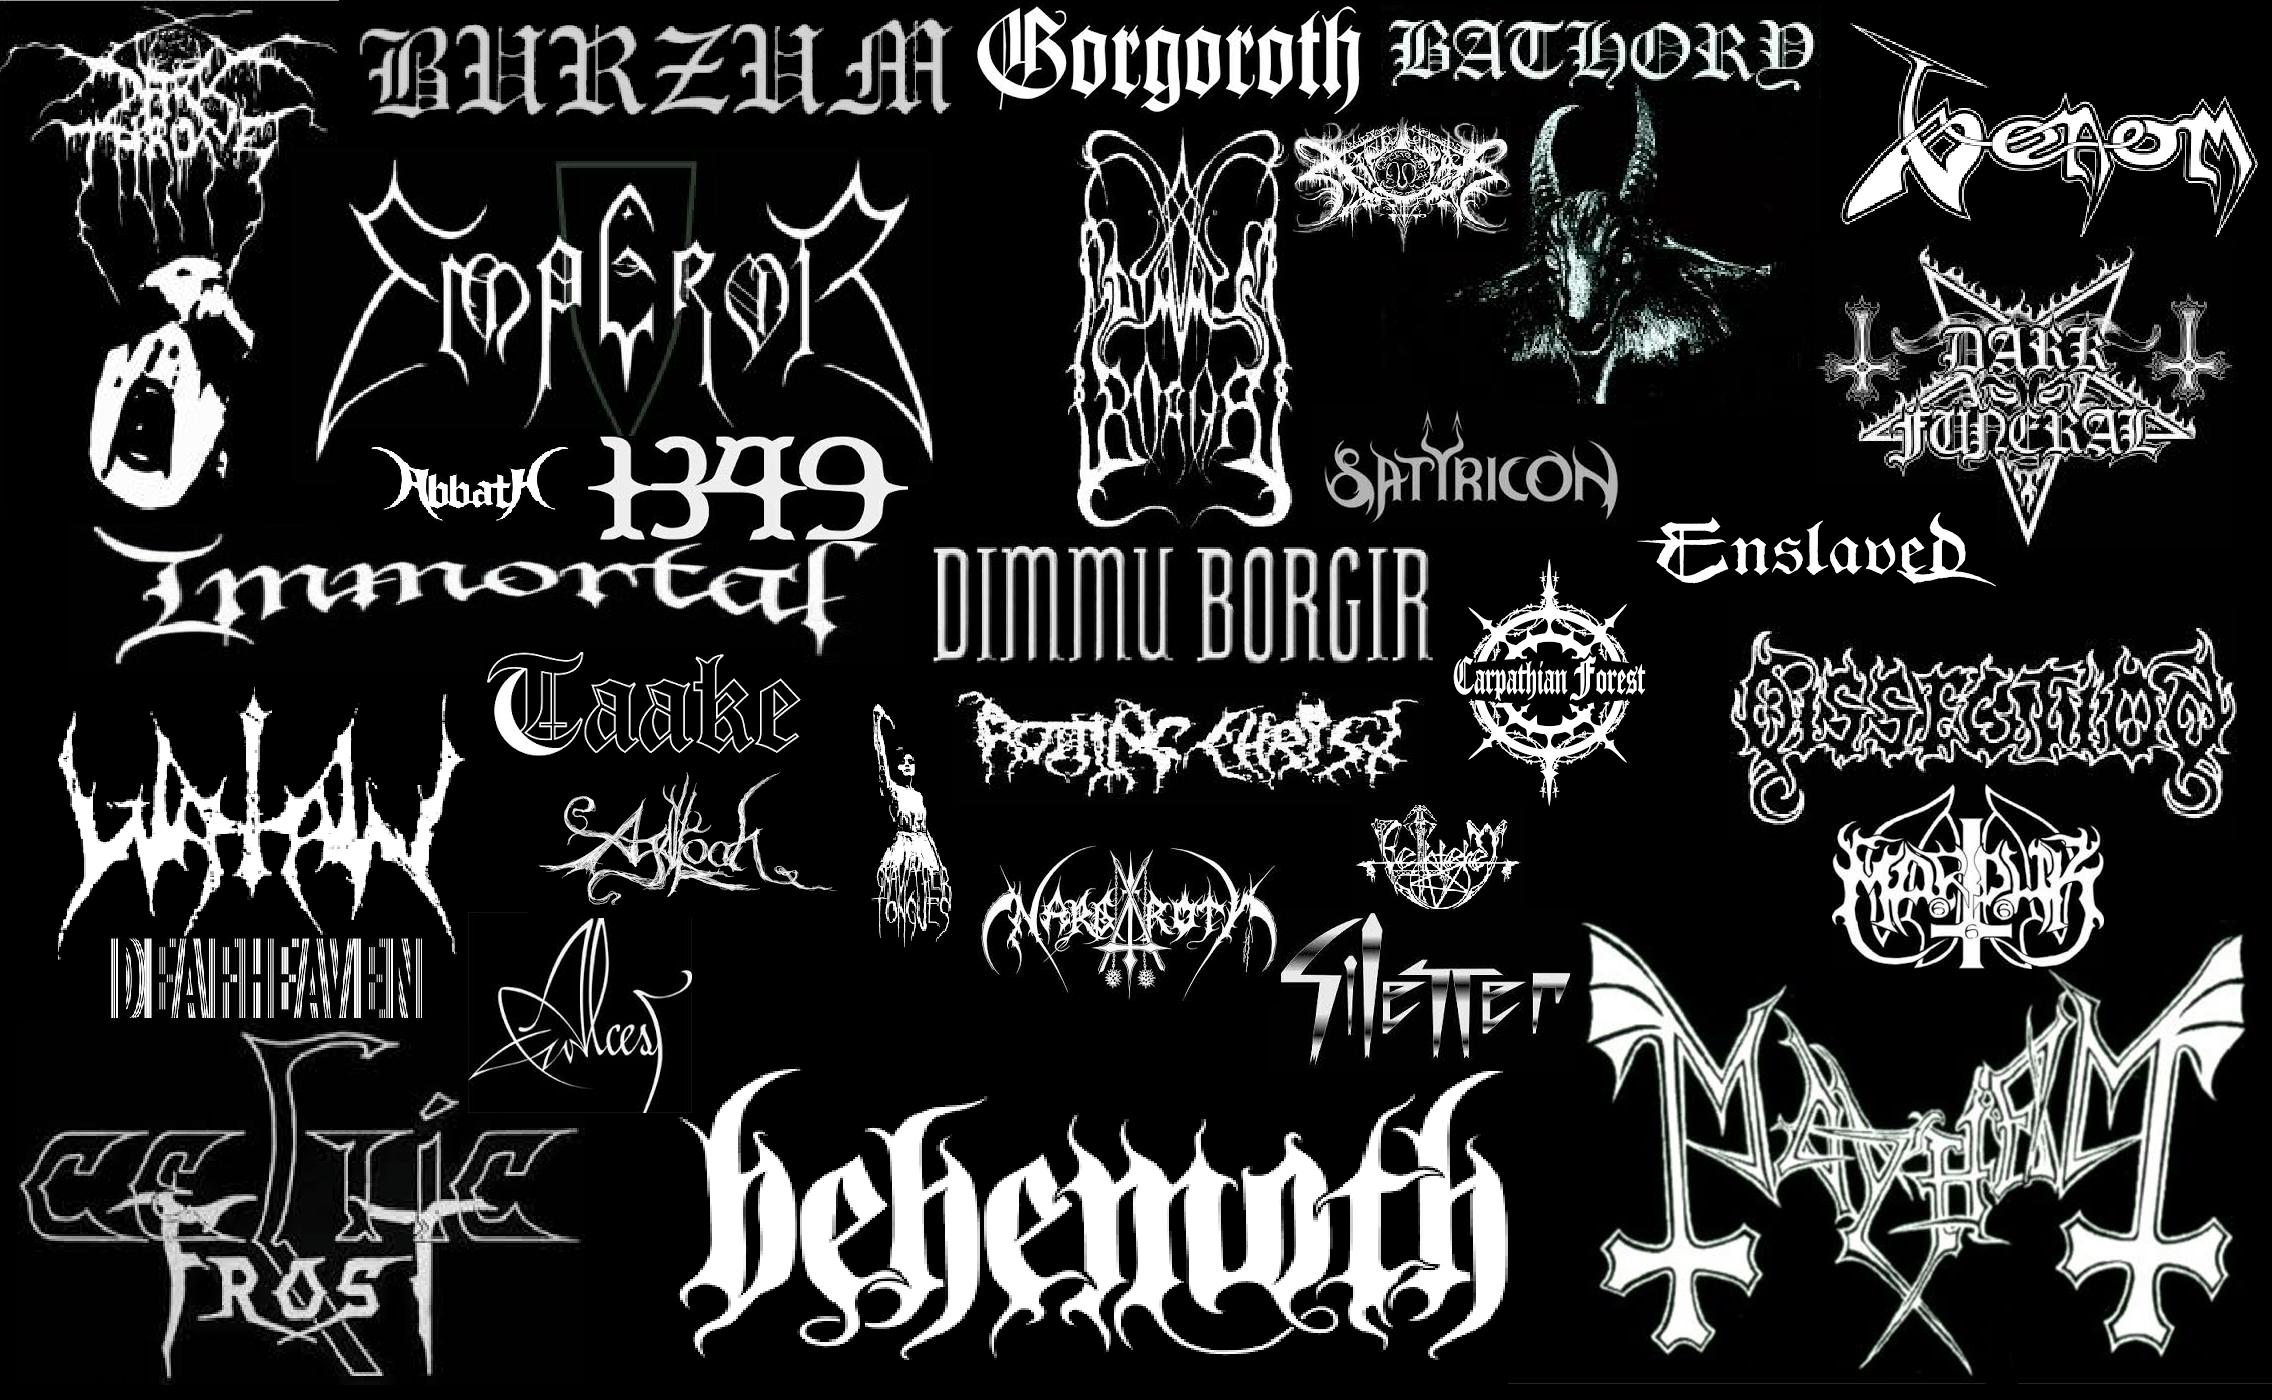 Black Metal Bands Wallpapers Wallpaper Cave